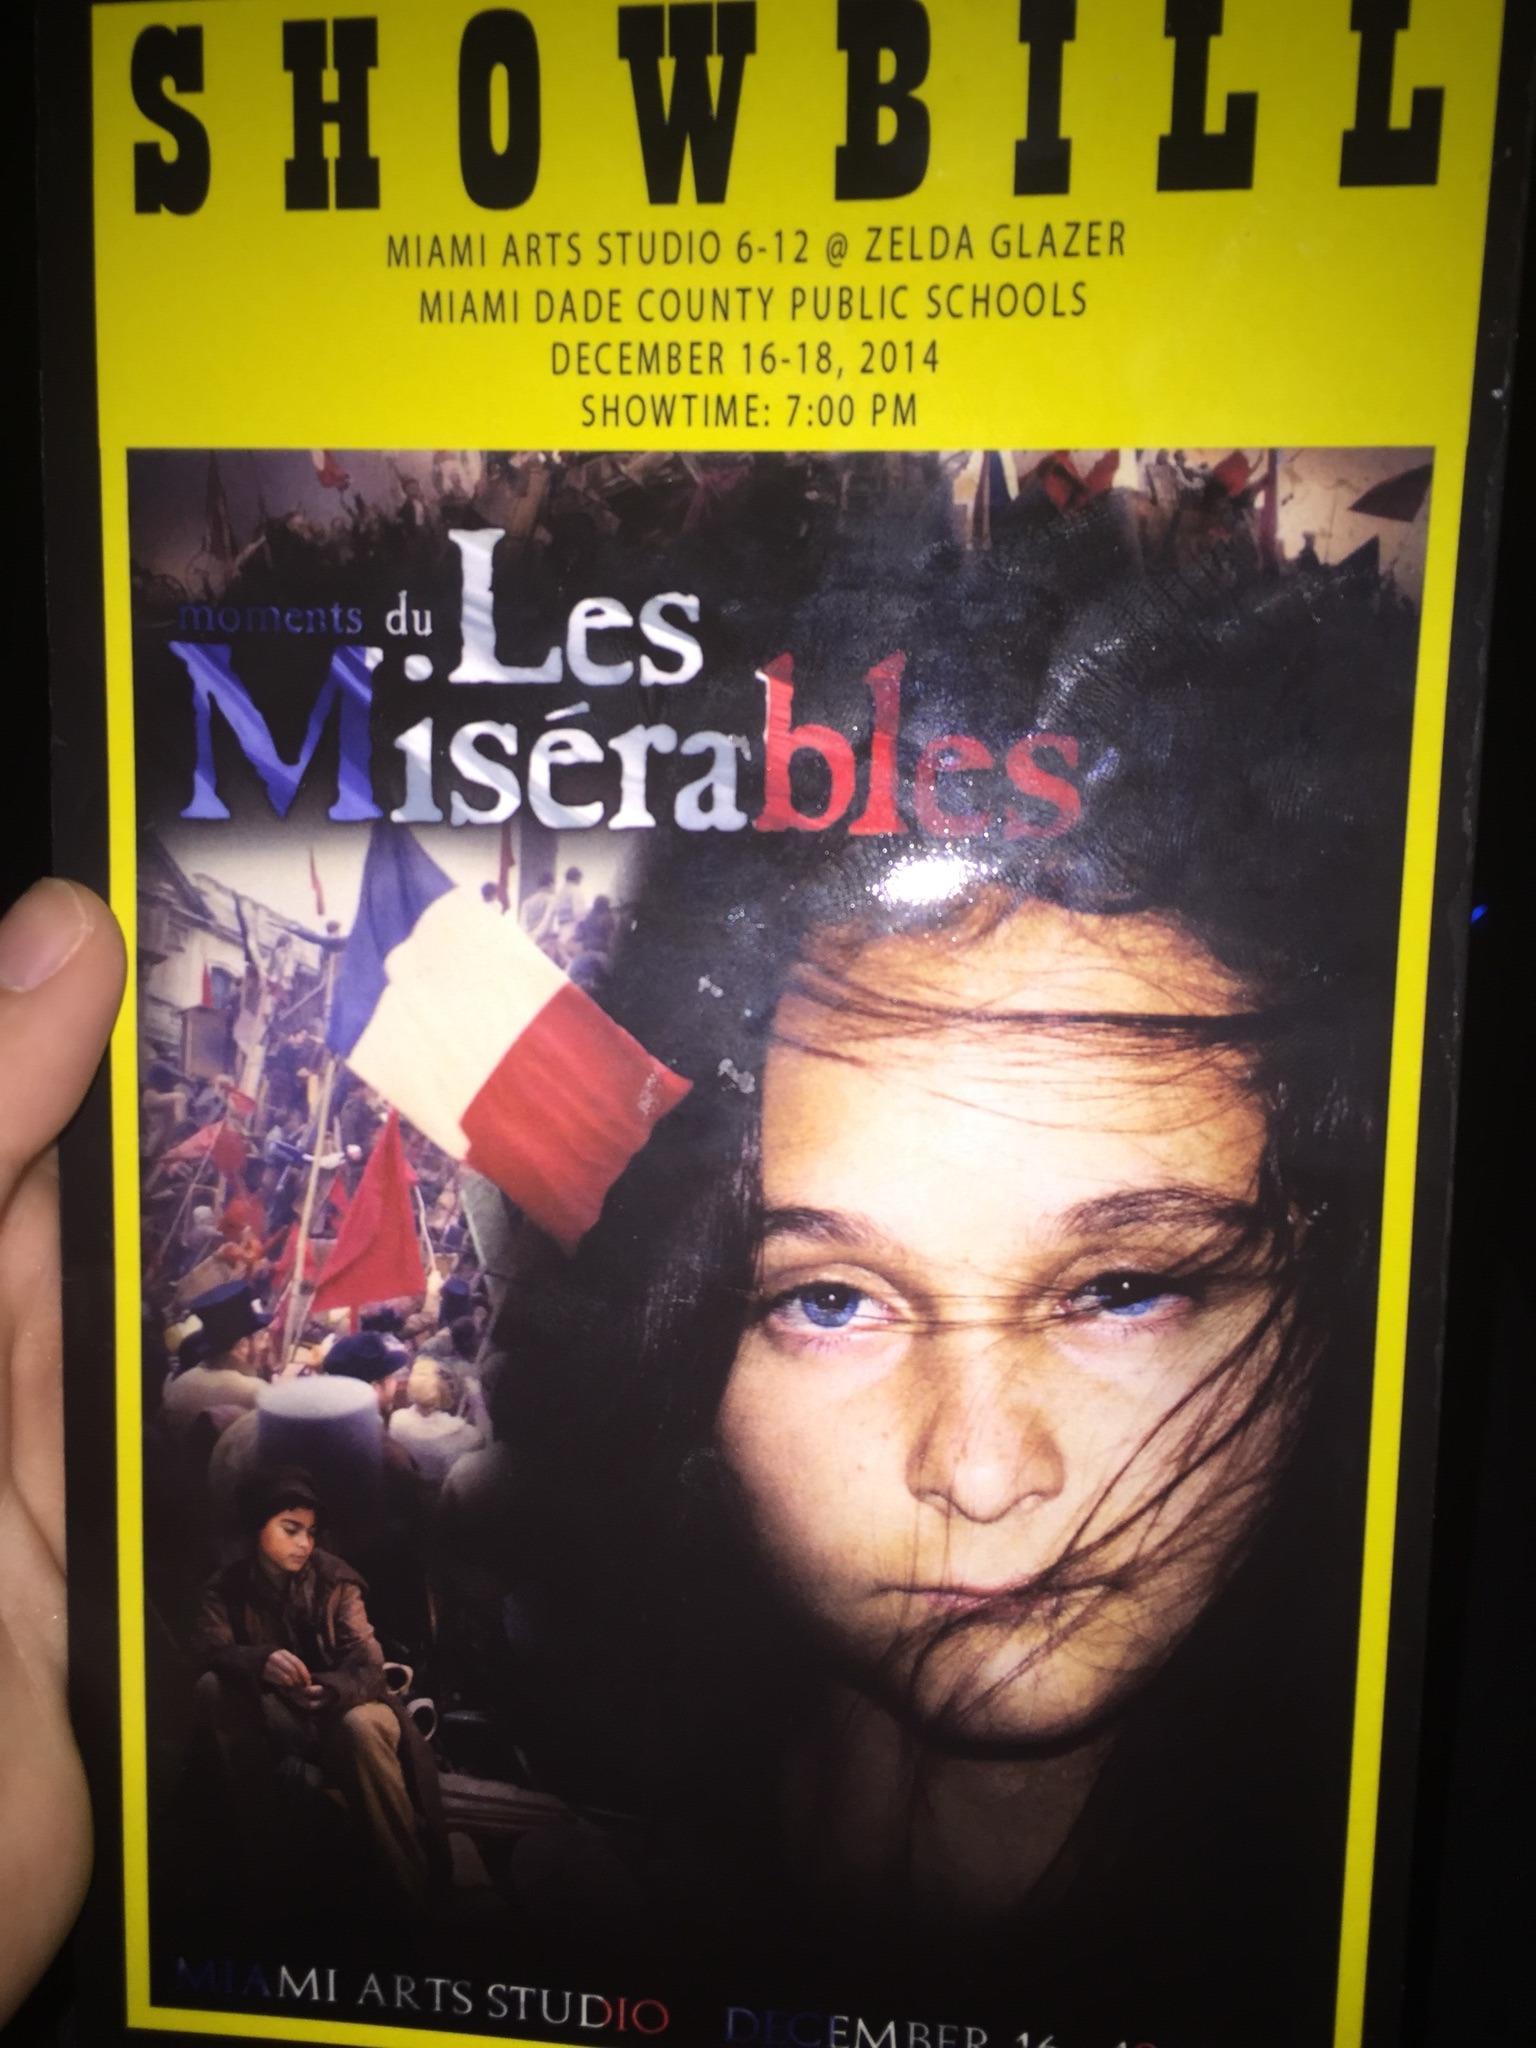 Moments Du Les Miserables performed by Miami Arts Studio at Zelda Glazer should be on Broadway wooooooow http://t.co/iqgIUfysr3